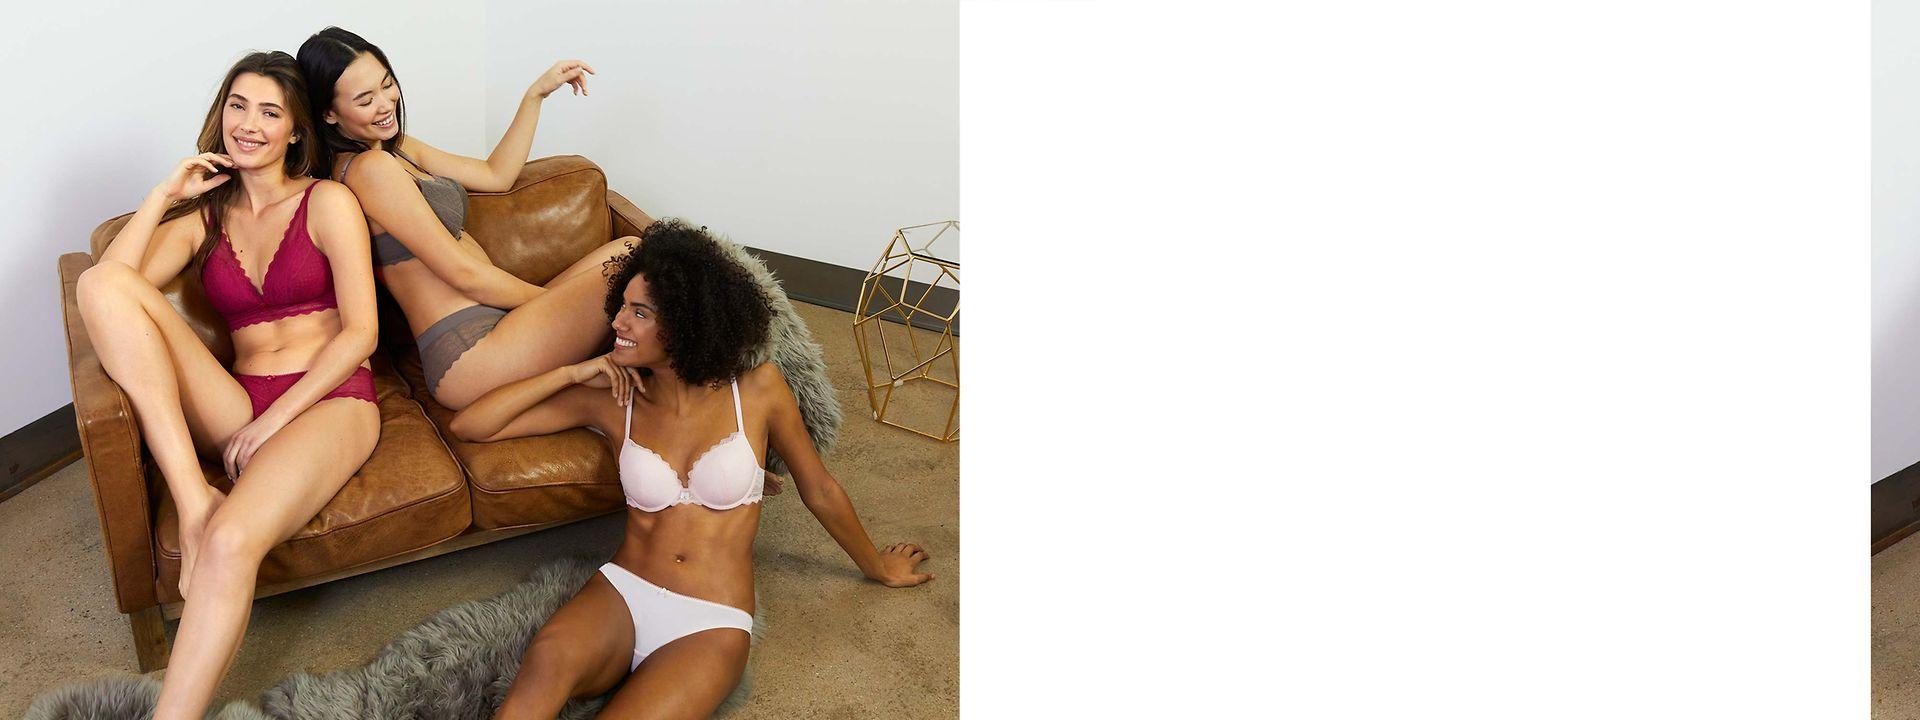 222021 - women - startpage - main banner - bodywear - IMG